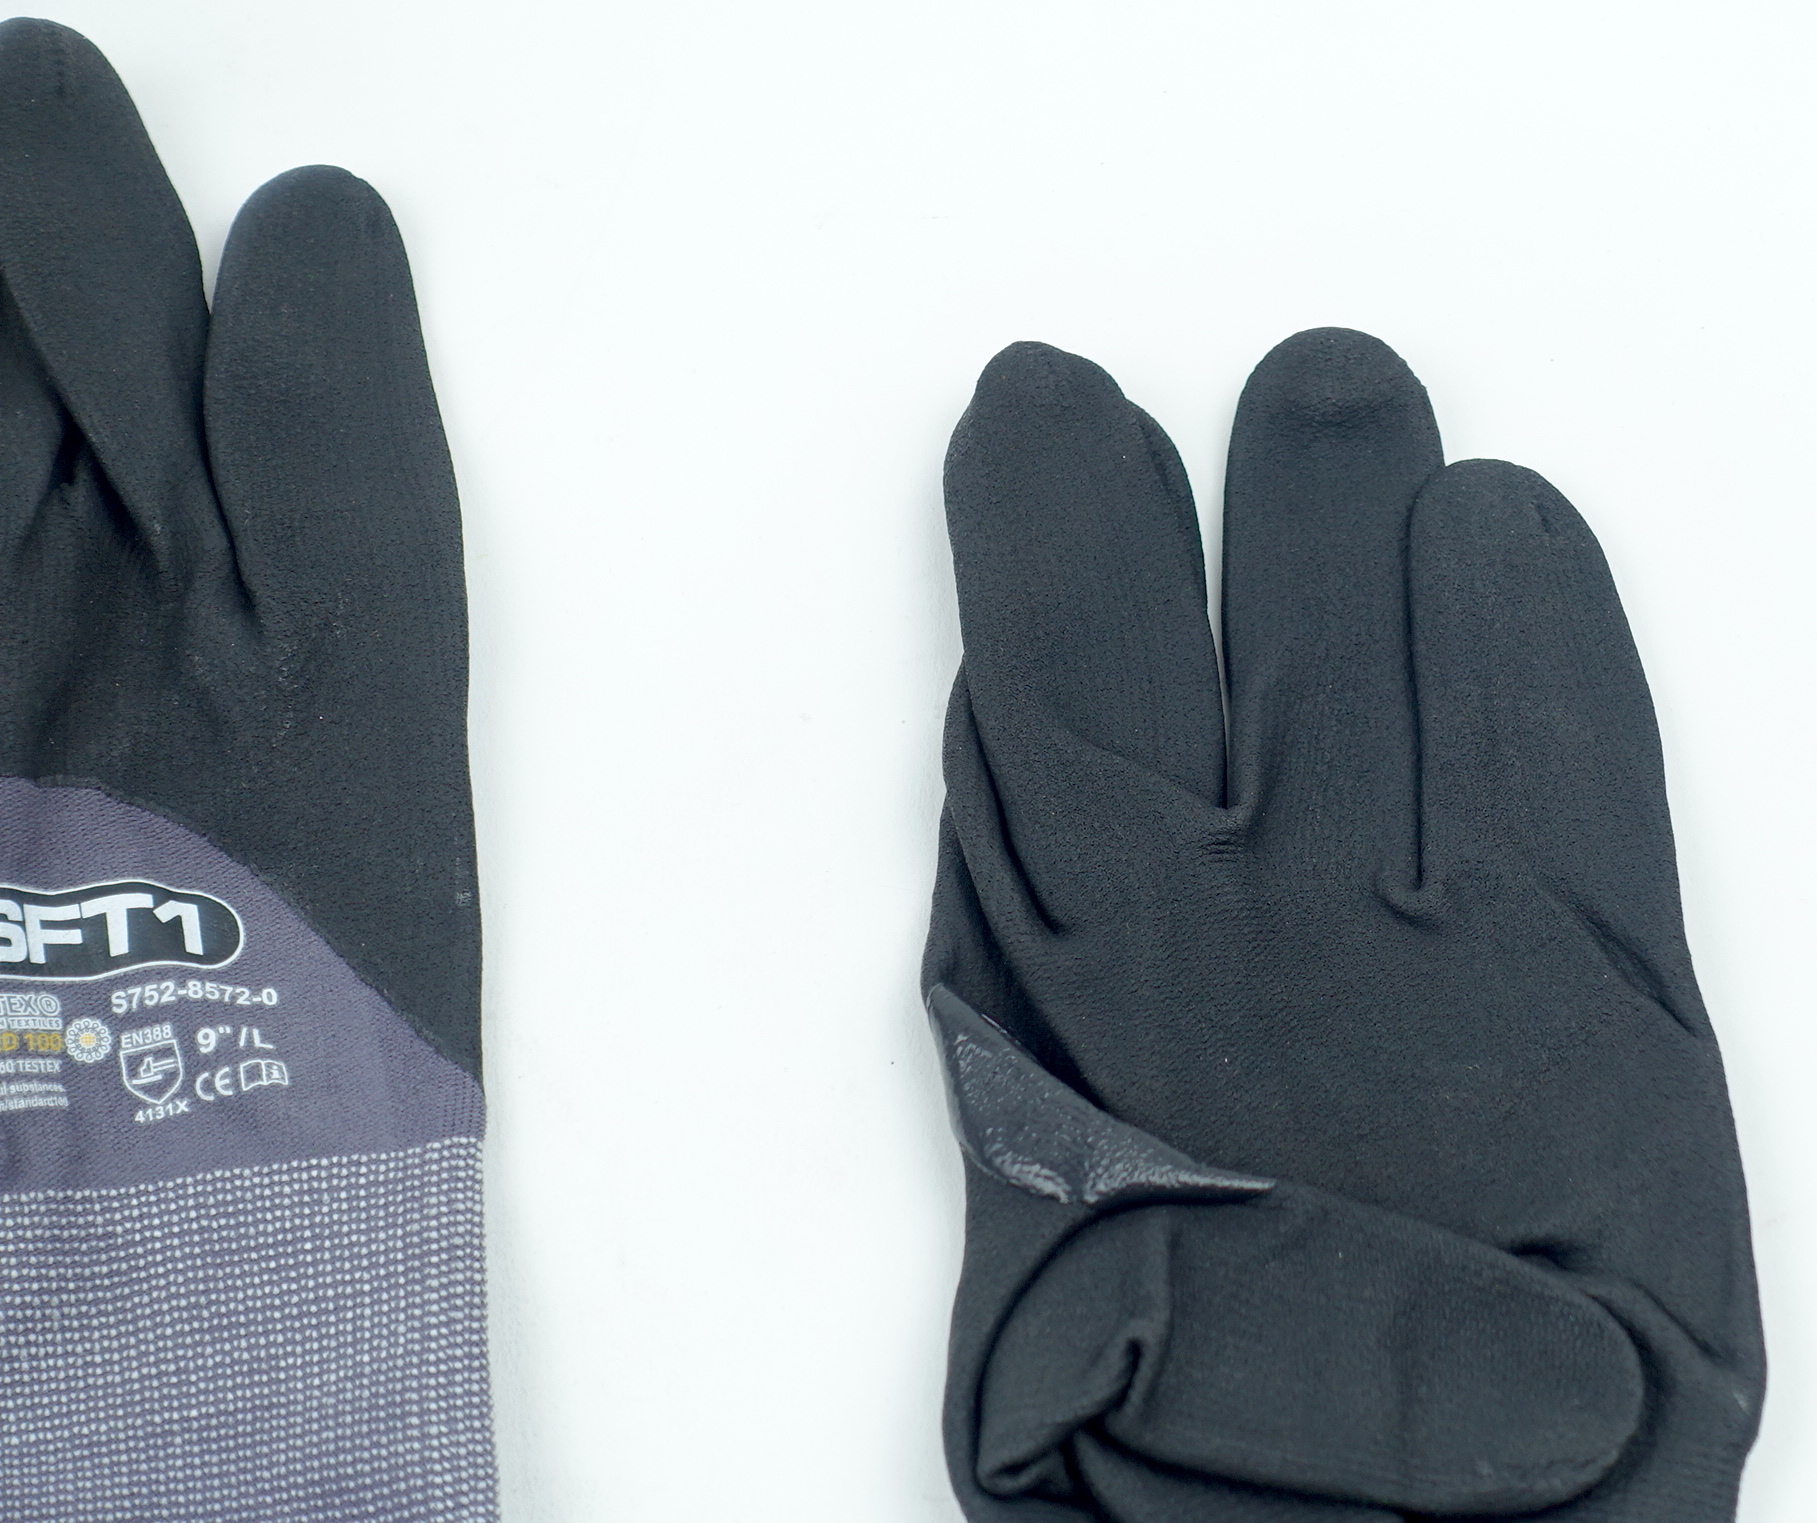 "Oeko-Tex S752-8572-0-9L SFT1 Standard 100 9"" Large Glove Gray/Black 1 Pair - image 6"